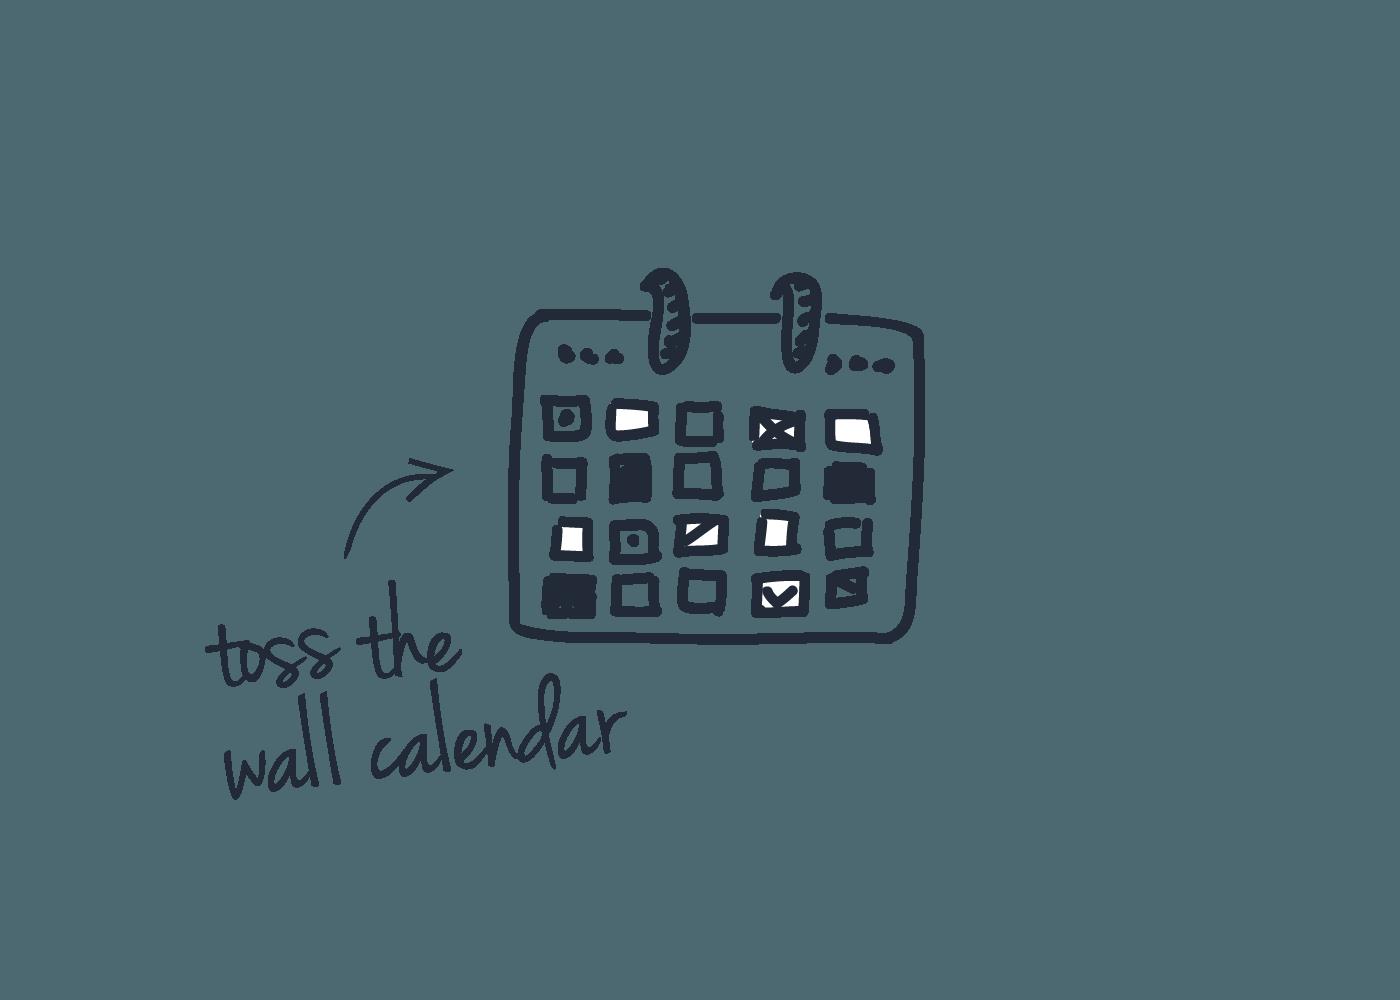 crm for sales reps calendar